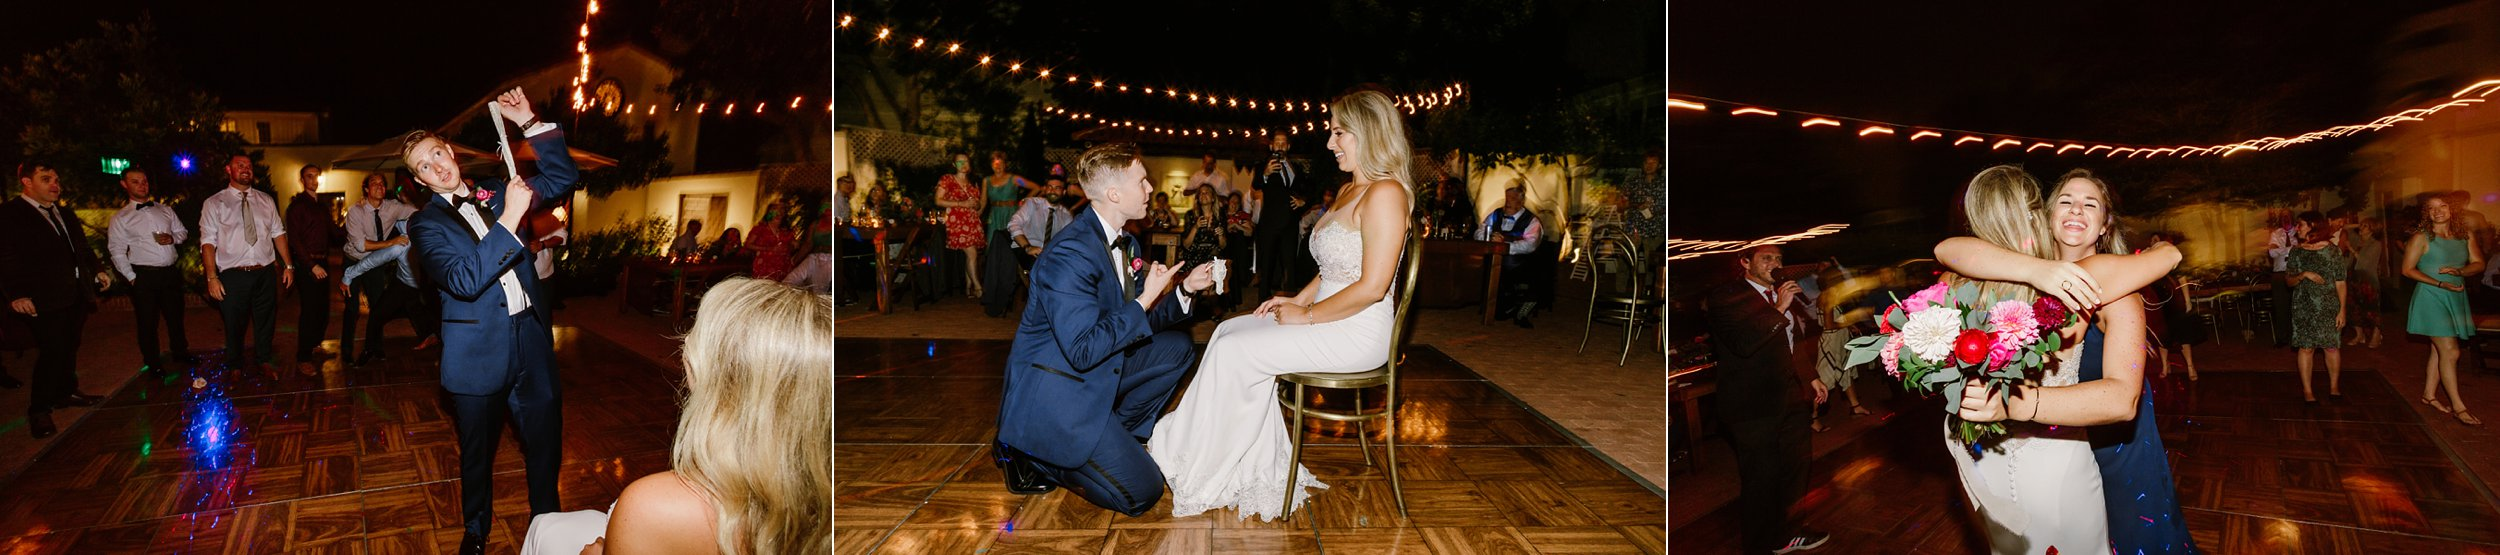 Briana and Sean Darlington House La Jolla Wedding_0091.jpg